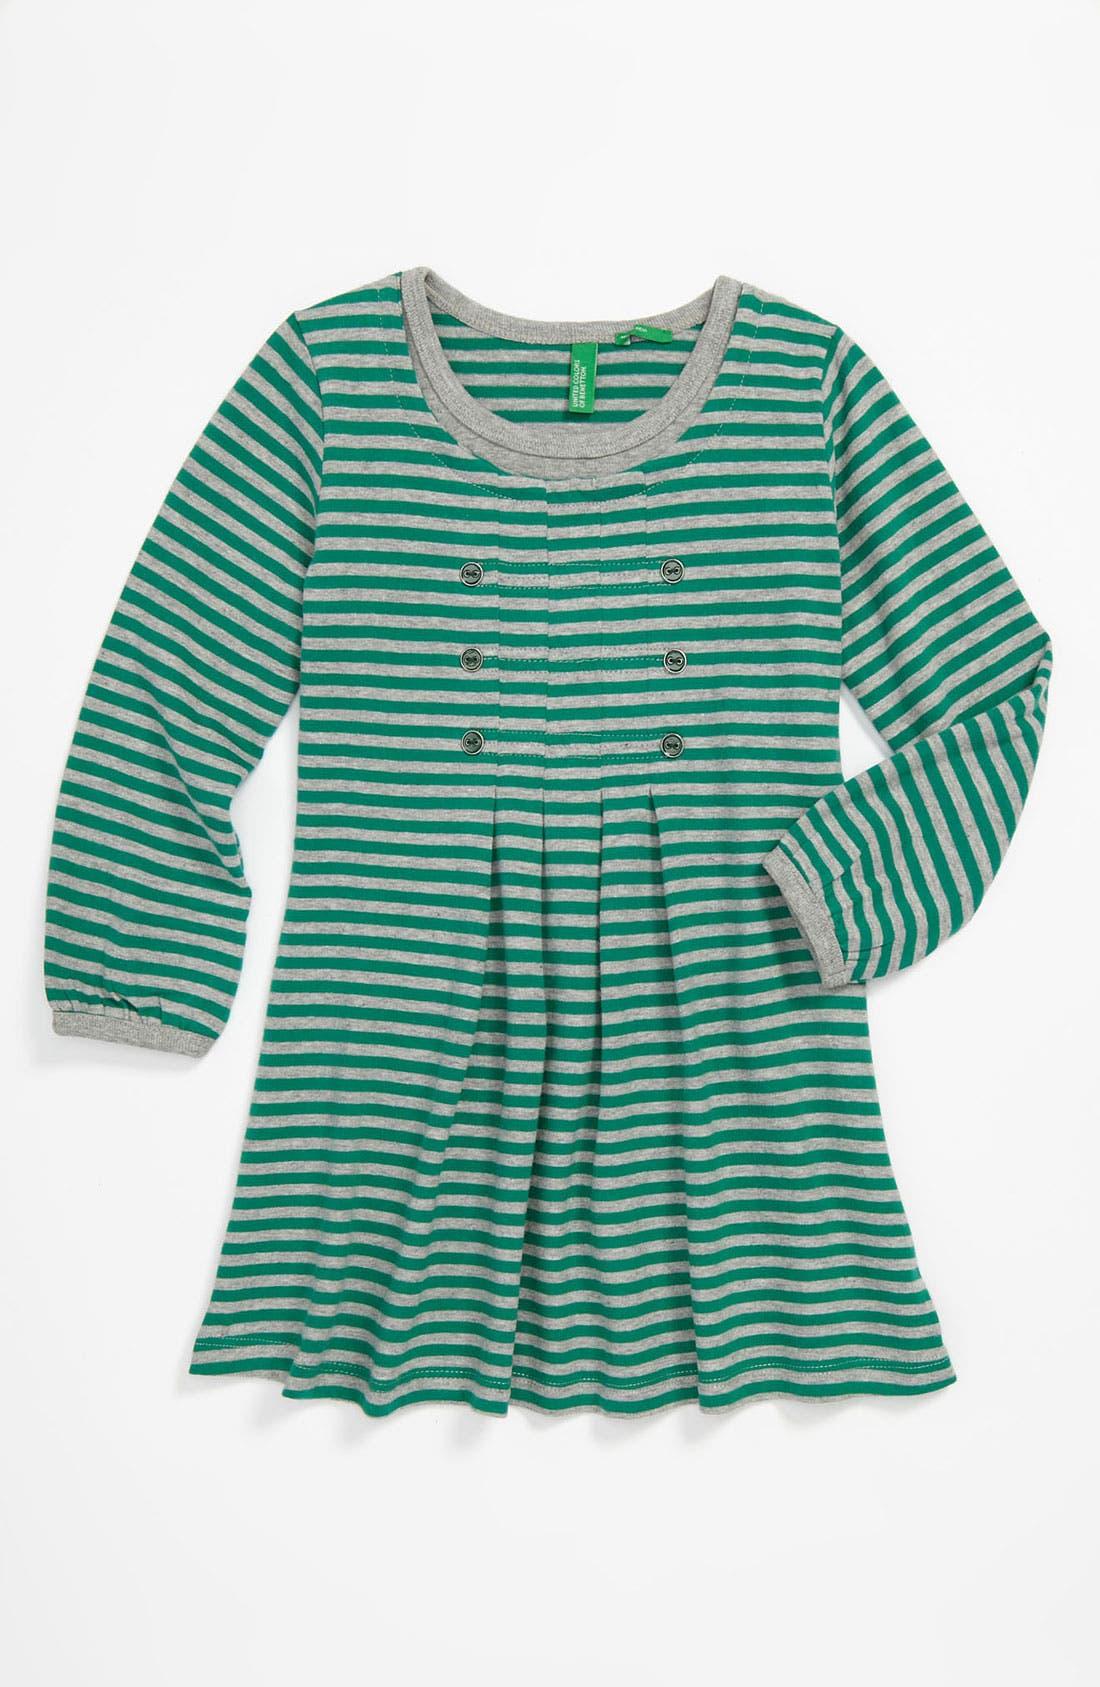 Main Image - United Colors of Benetton Kids Stripe Dress (Toddler)